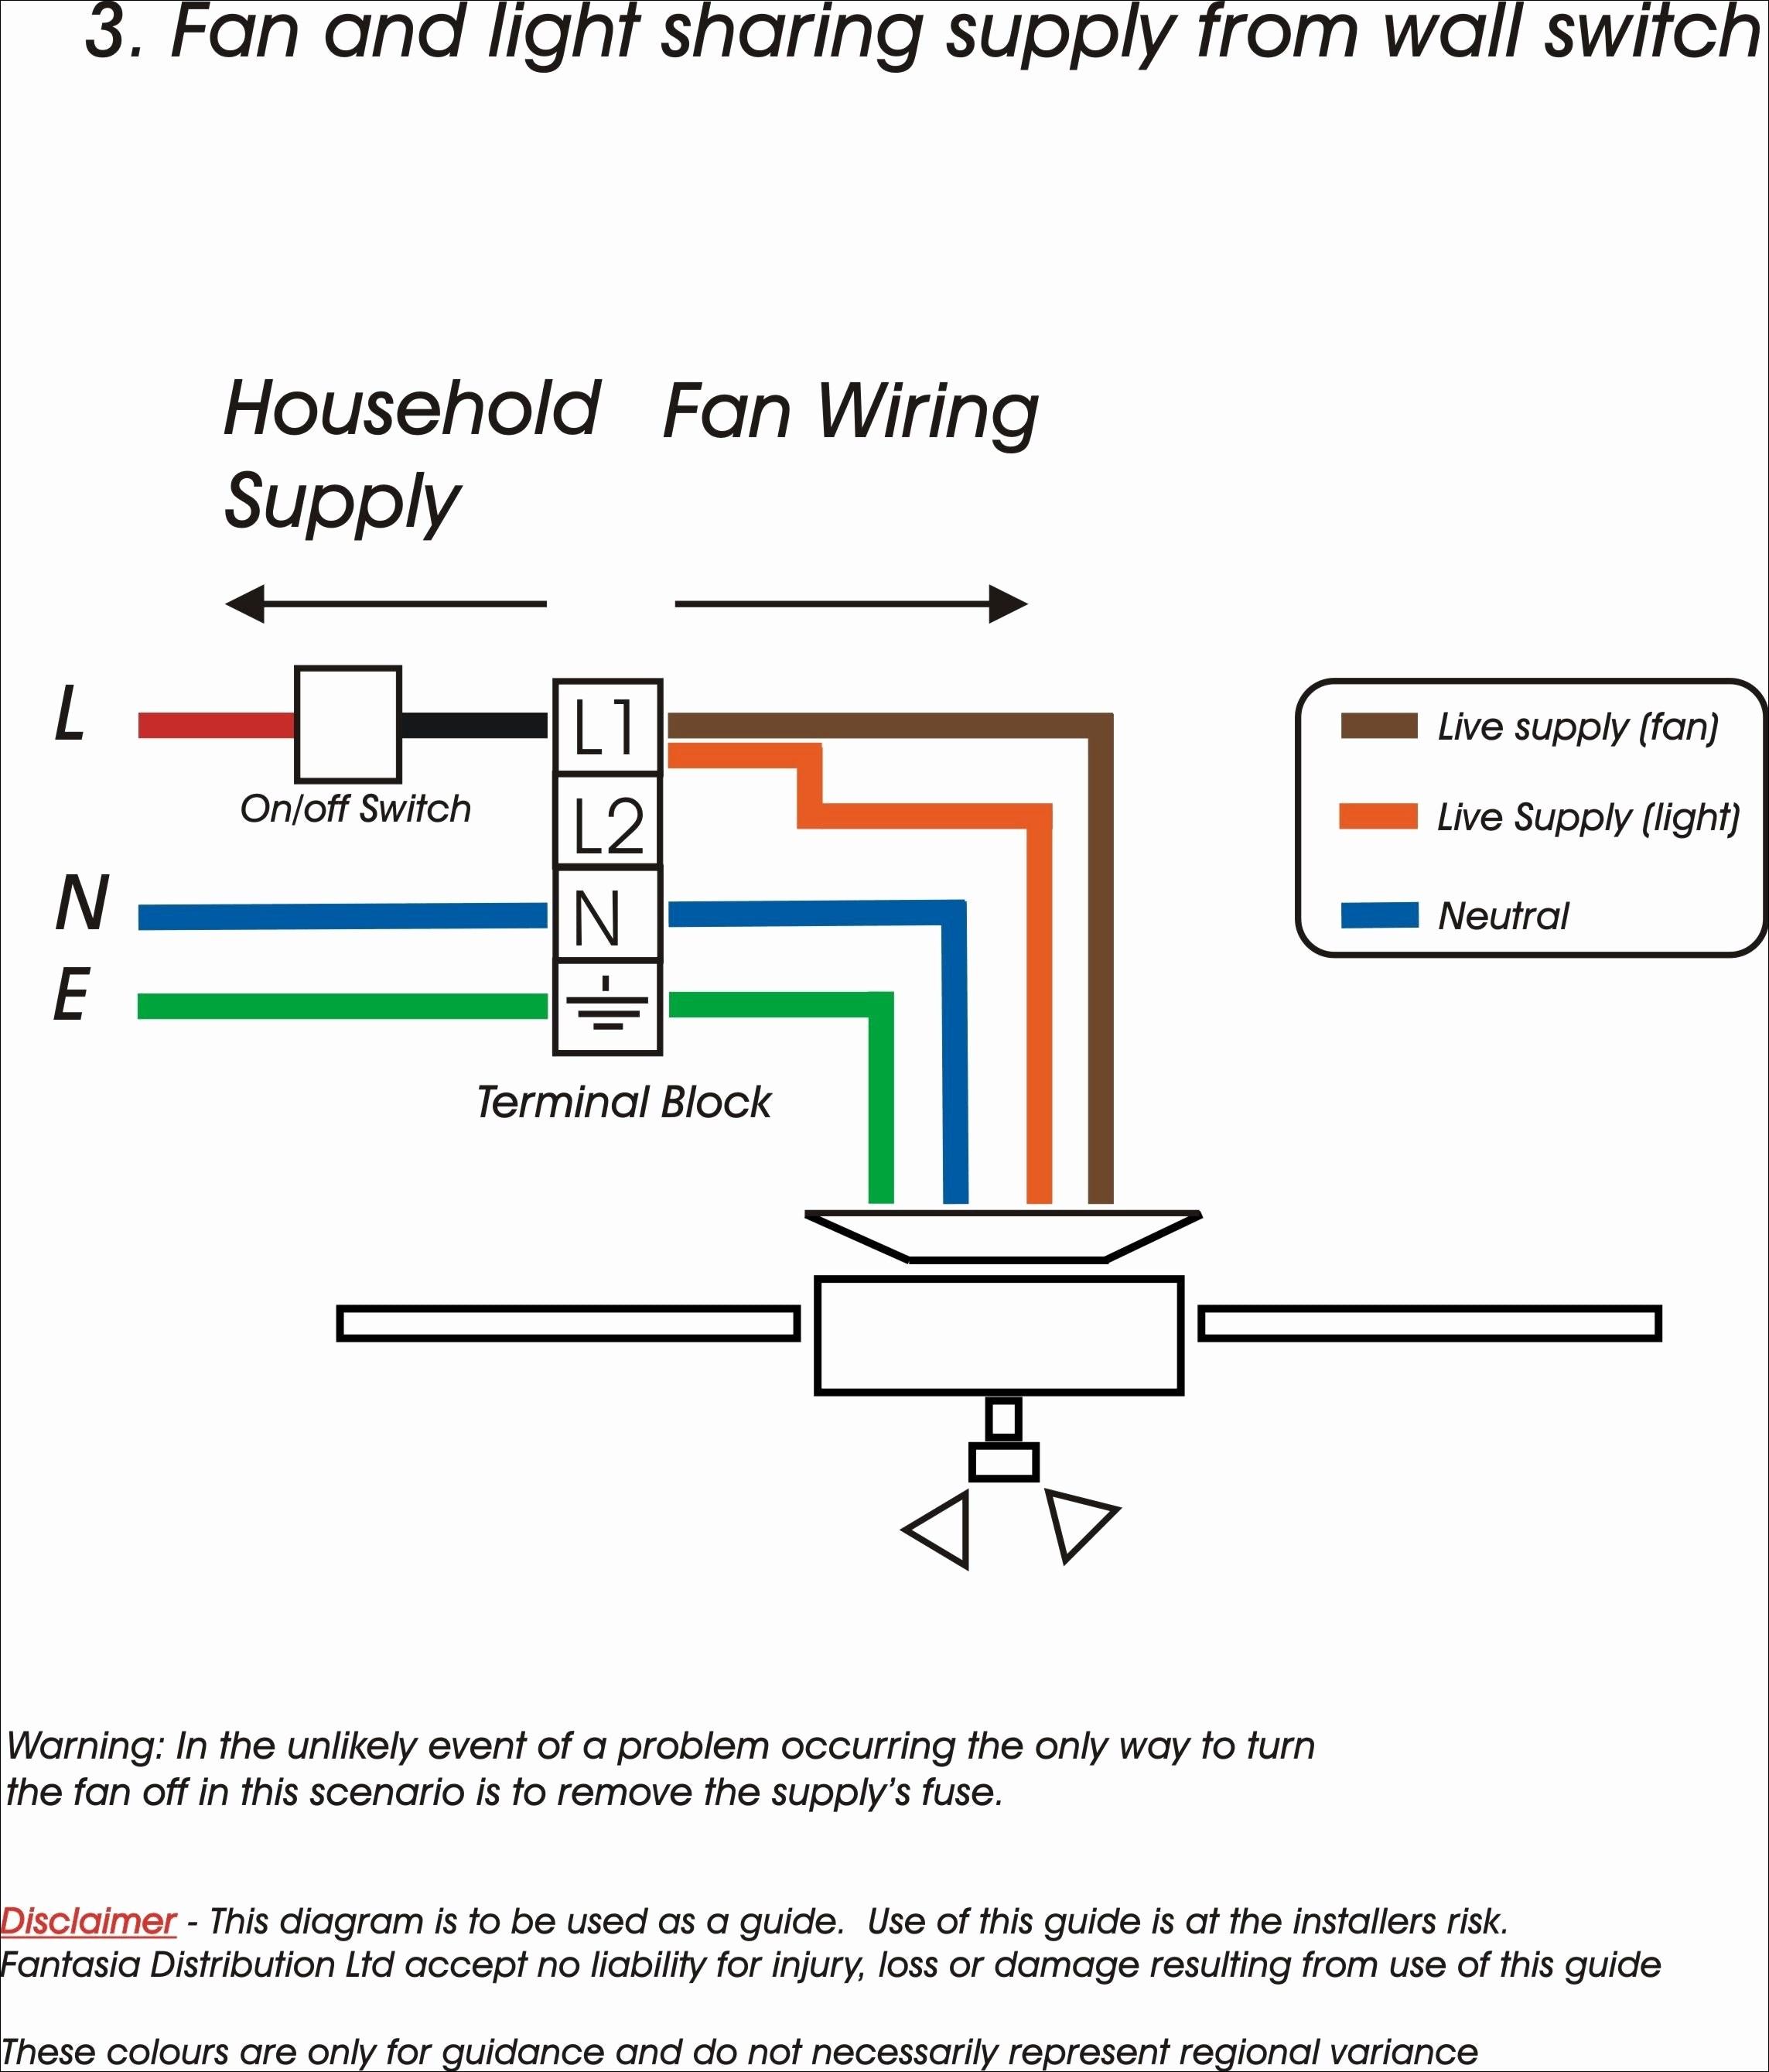 Wired Smoke Detector Wiring Diagram | Best Wiring Library - 4 Wire Smoke Detector Wiring Diagram